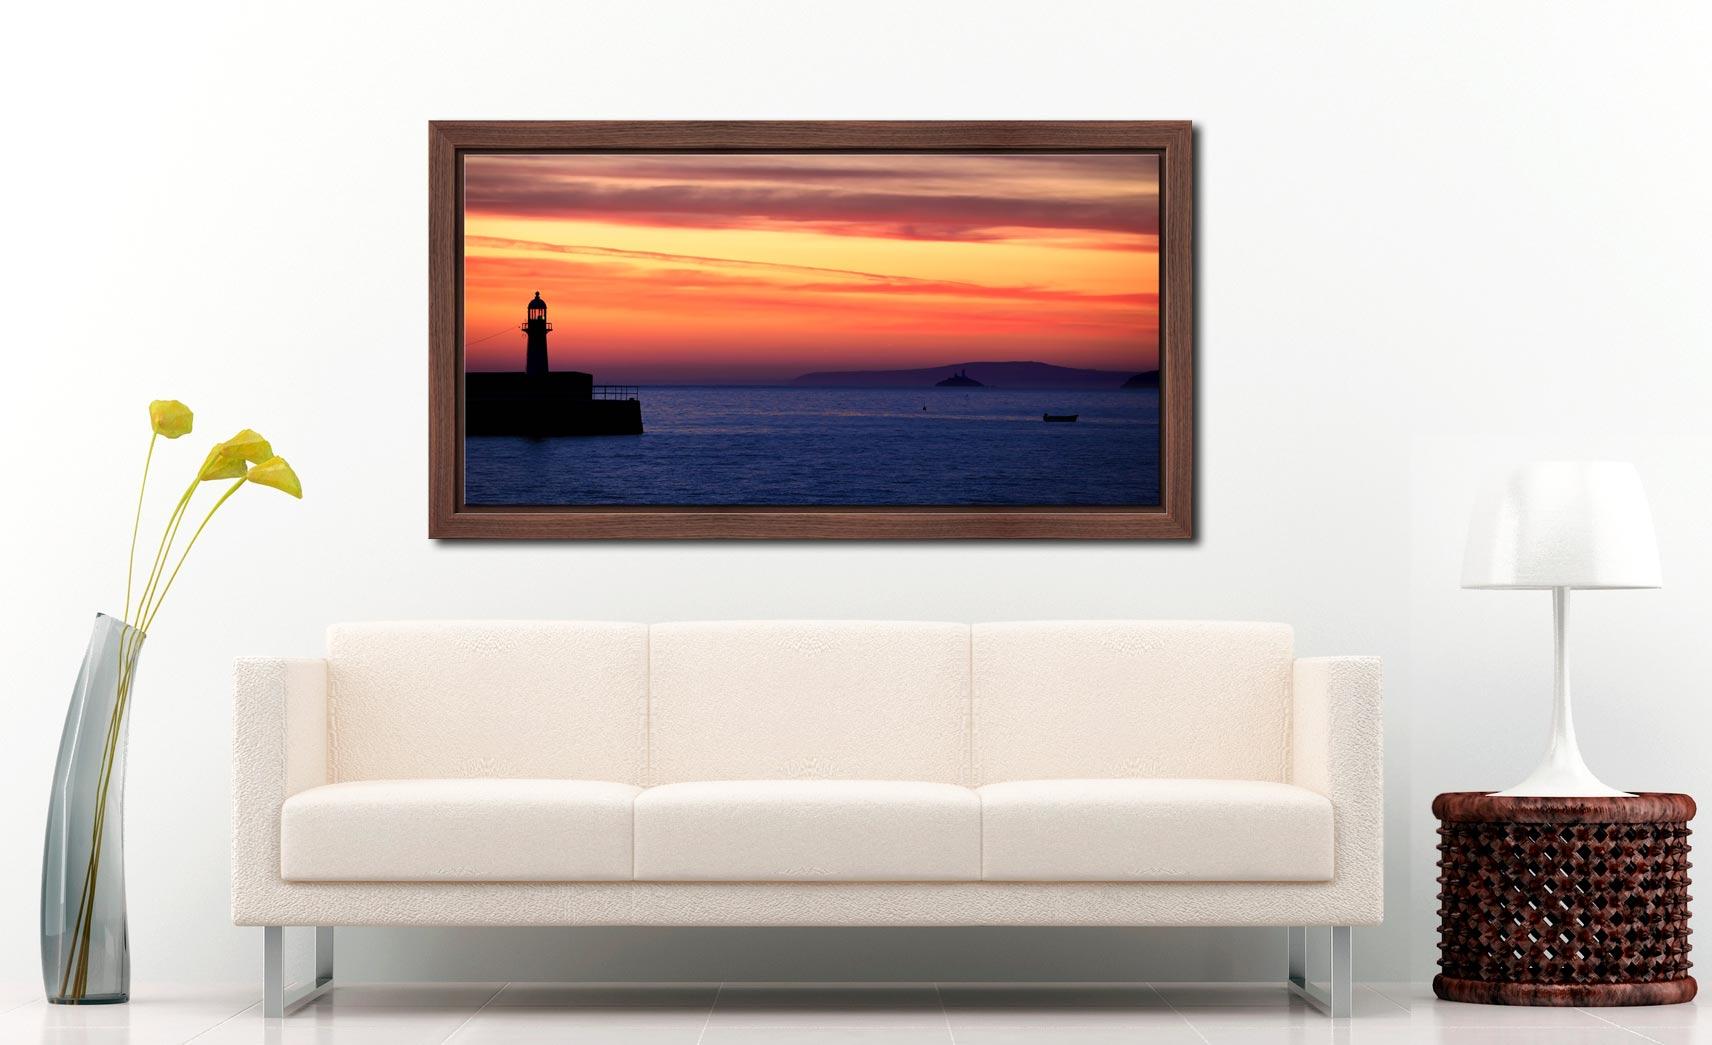 St Ives Beach Rocks - Walnut floater frame with acrylic glazing on Wall